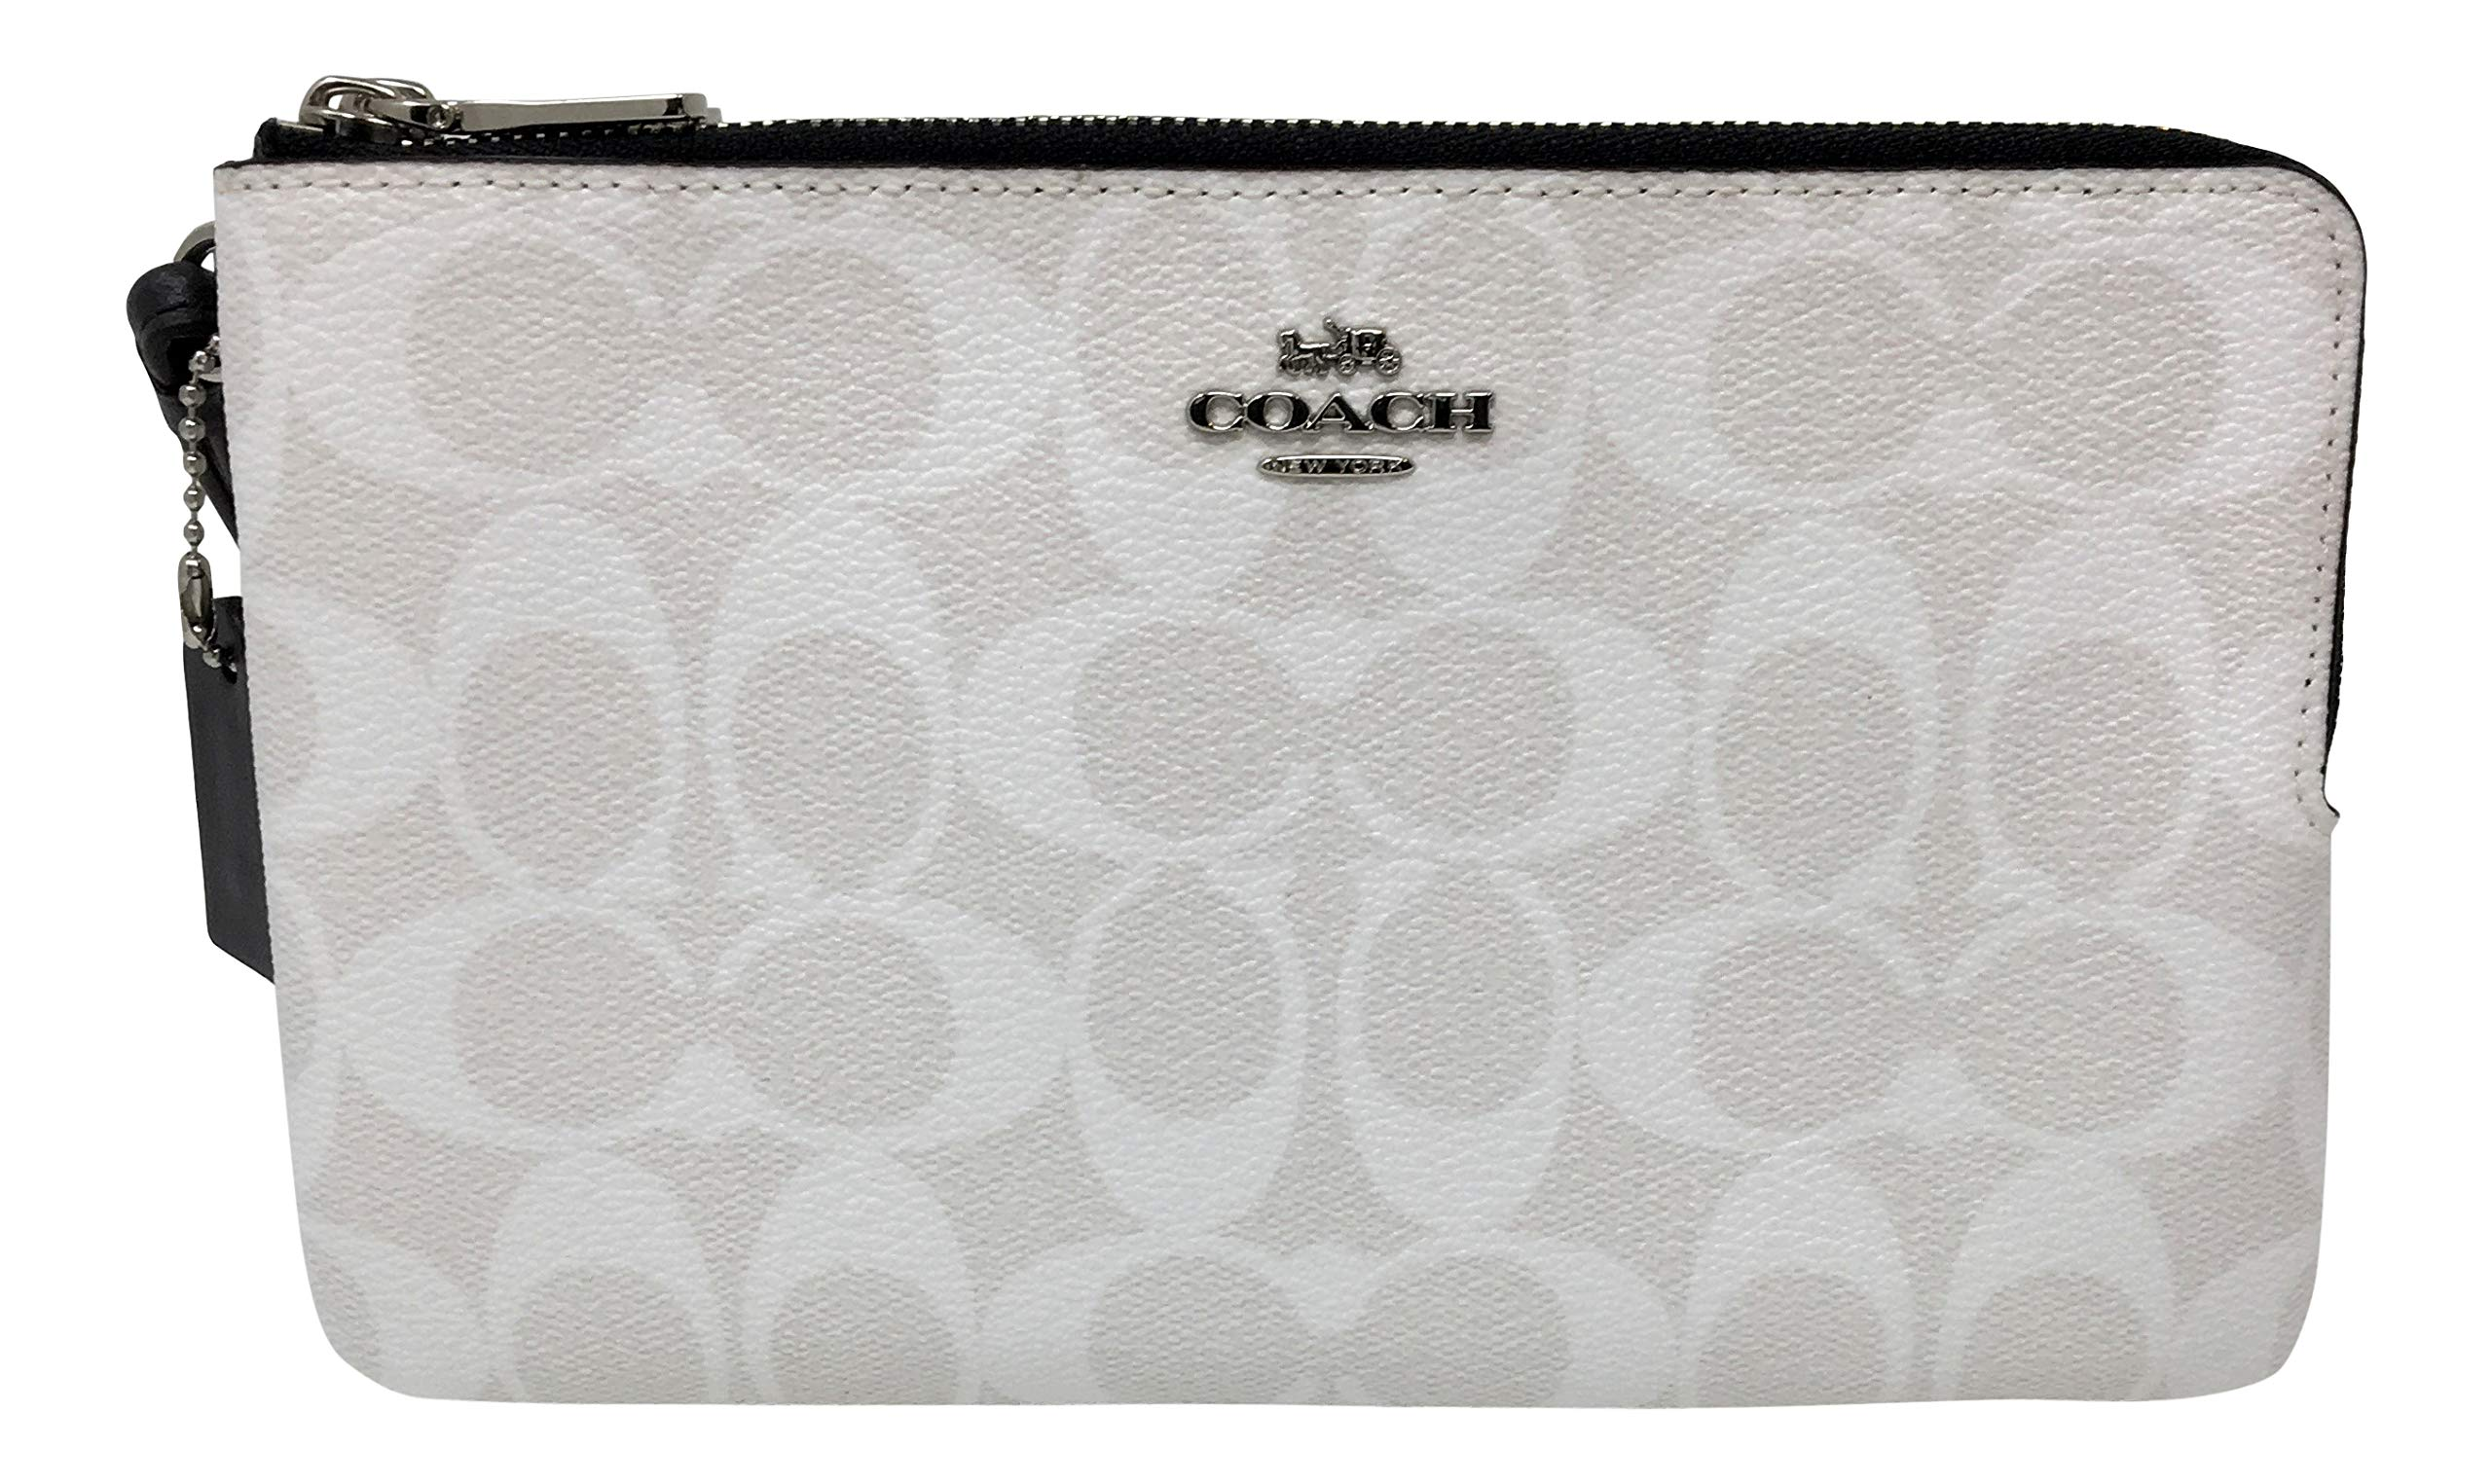 Coach Signature Large Double Zip Wristlet Bag Purse Chalk Midnight F16109